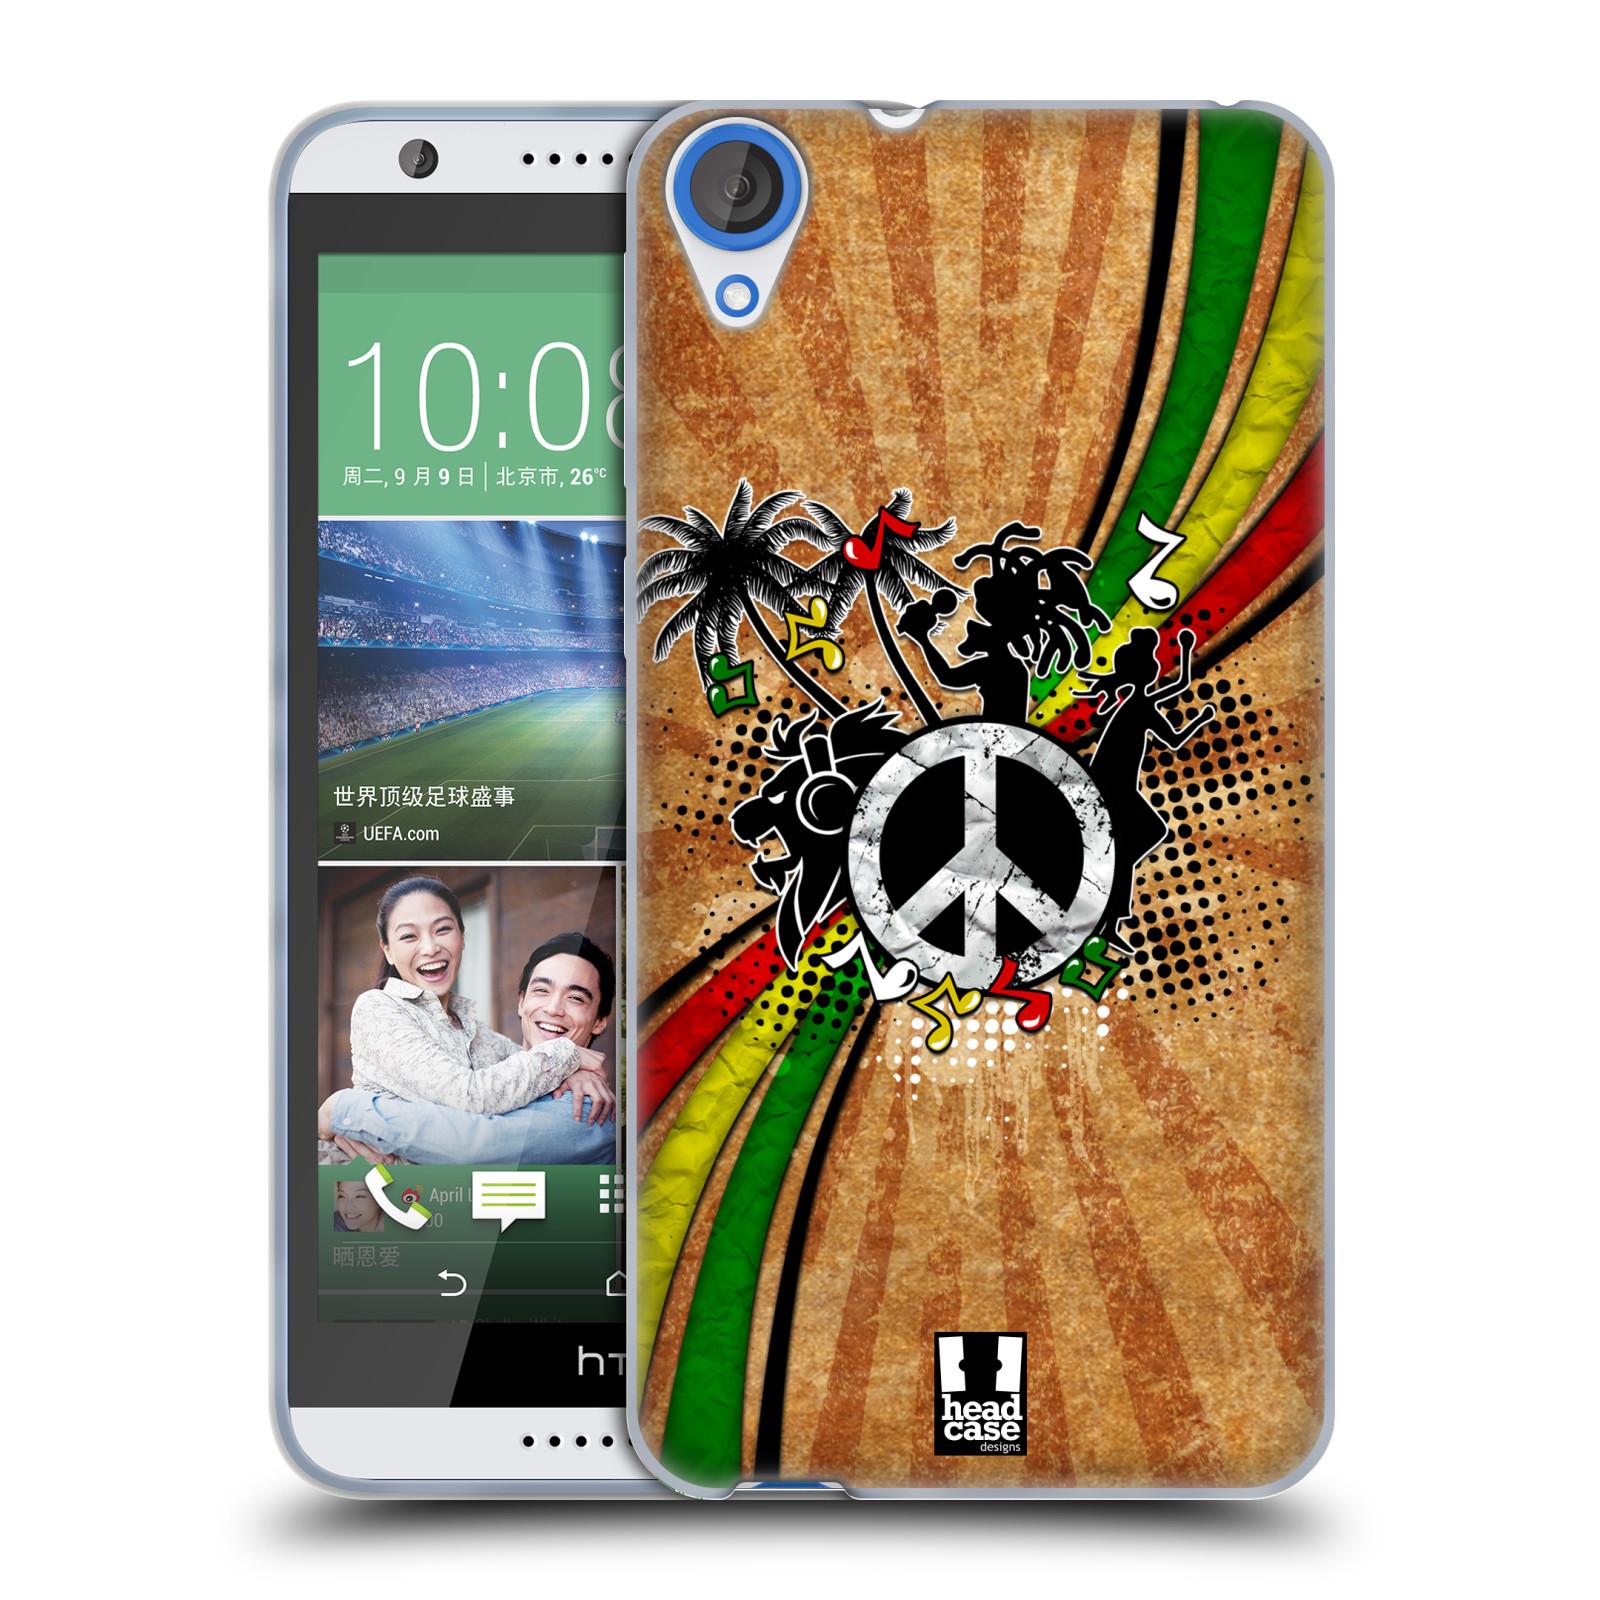 Silikonové pouzdro na mobil HTC Desire 820 HEAD CASE REGGAE (Silikonový kryt či obal na mobilní telefon HTC Desire 820)